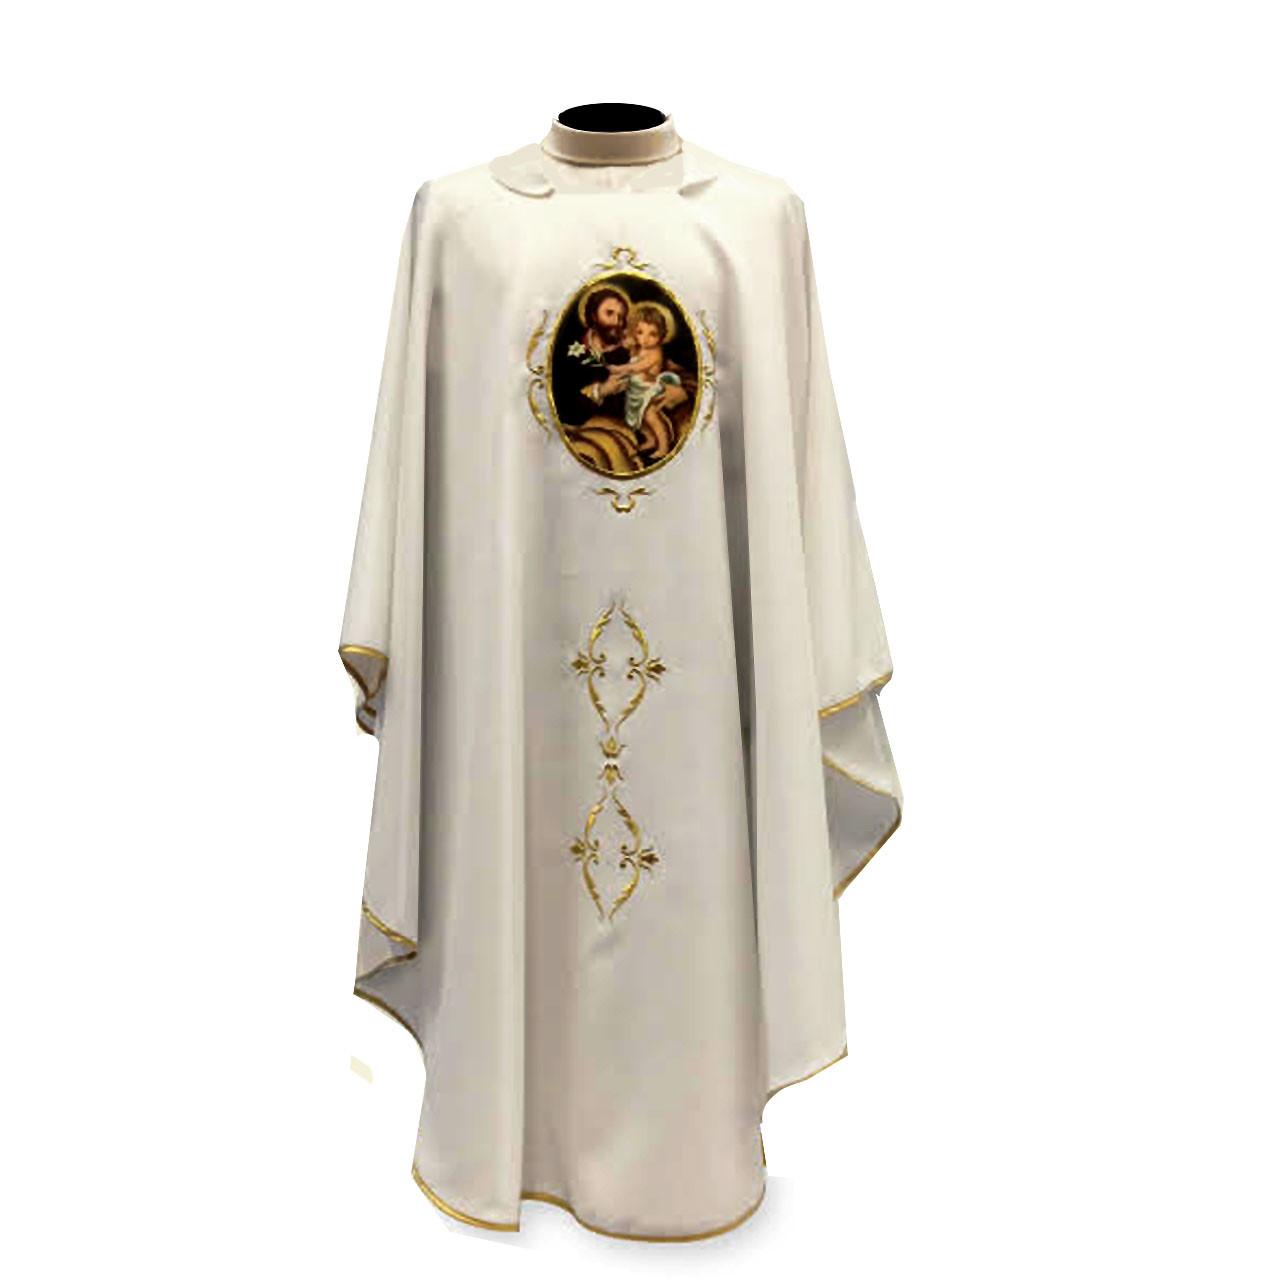 644 Year of Saint Joseph Chasuble from Solivari